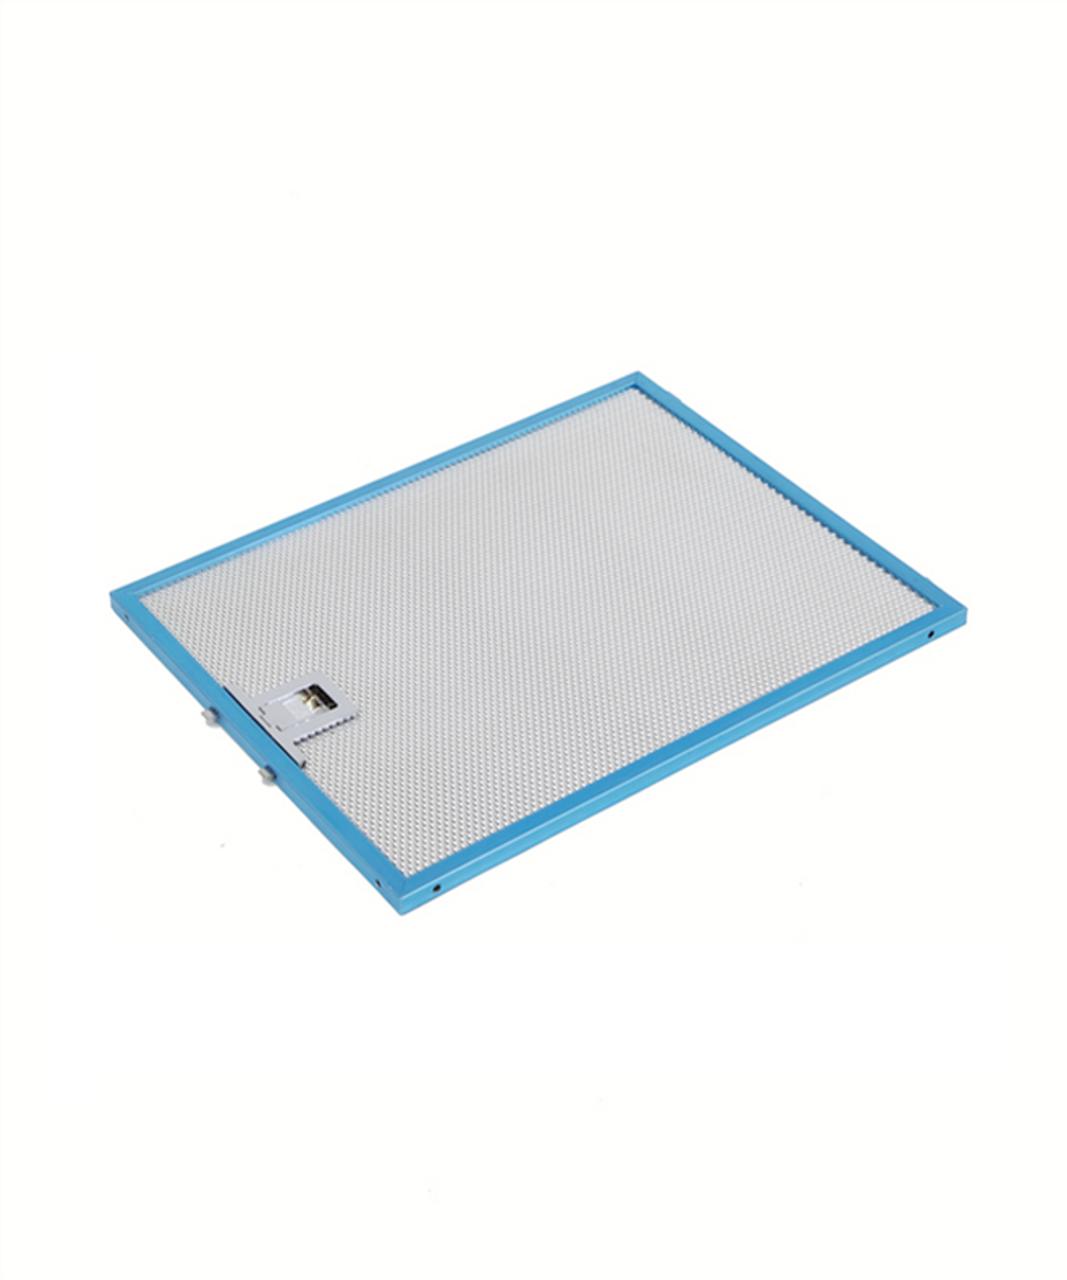 Fisher & Paykel R104165 - Charcoal Rangehood Filter